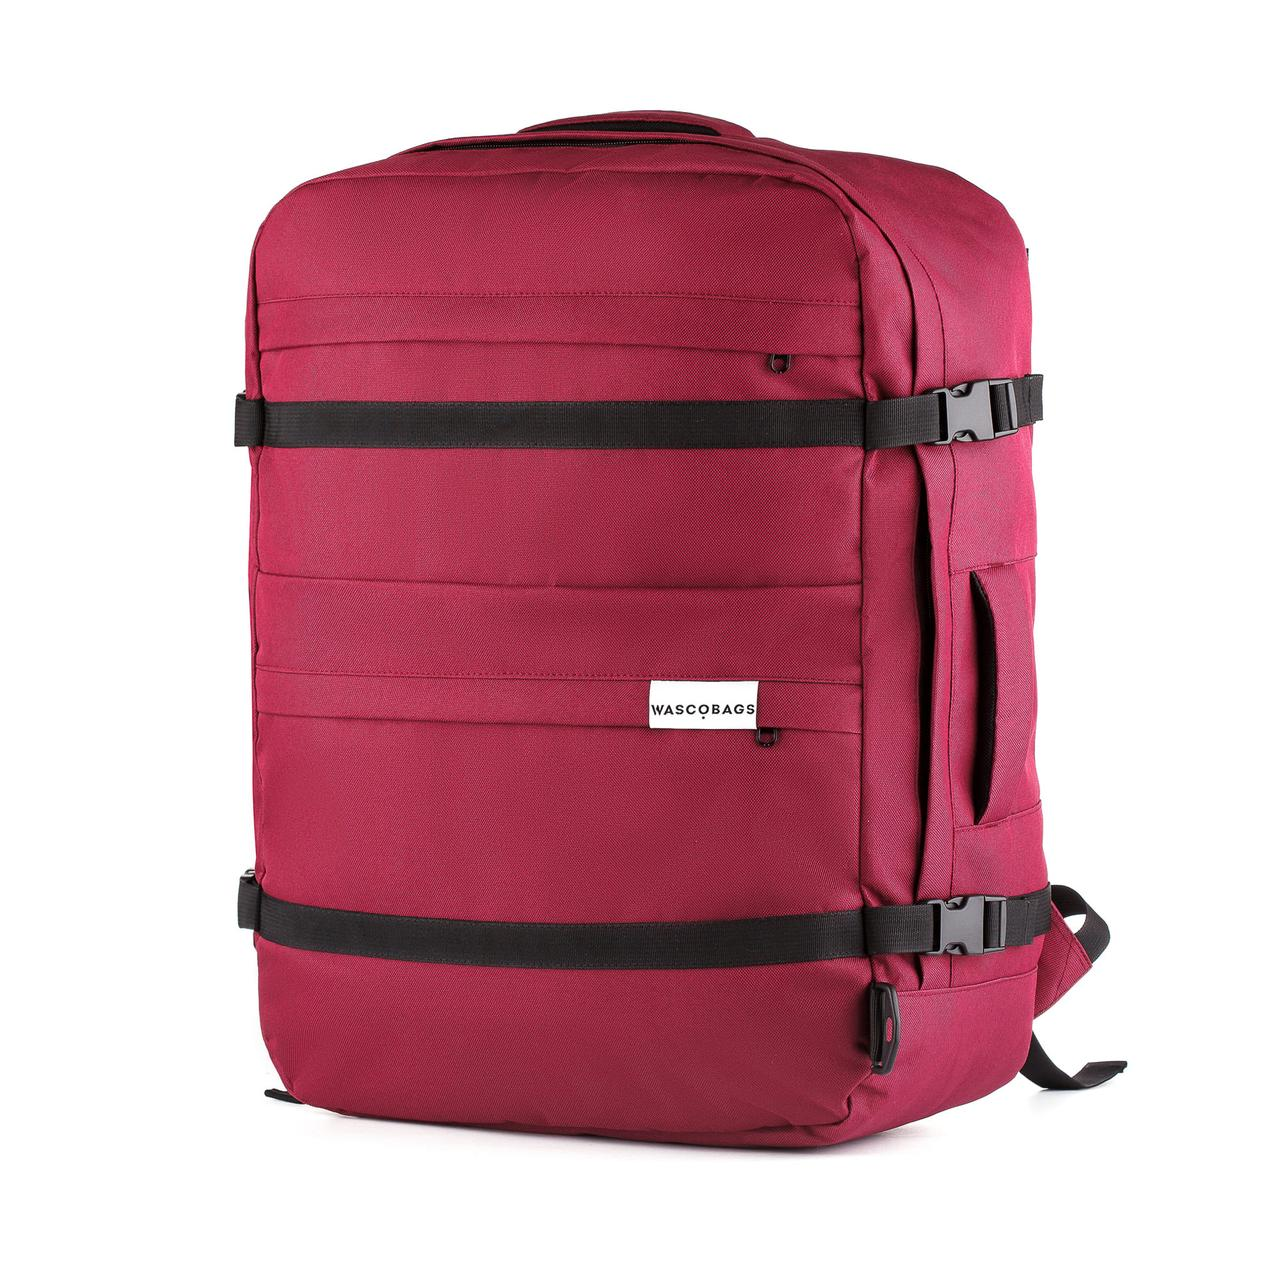 Рюкзак для ручной клади Wascobags Traveller 55x40x20 Вишня